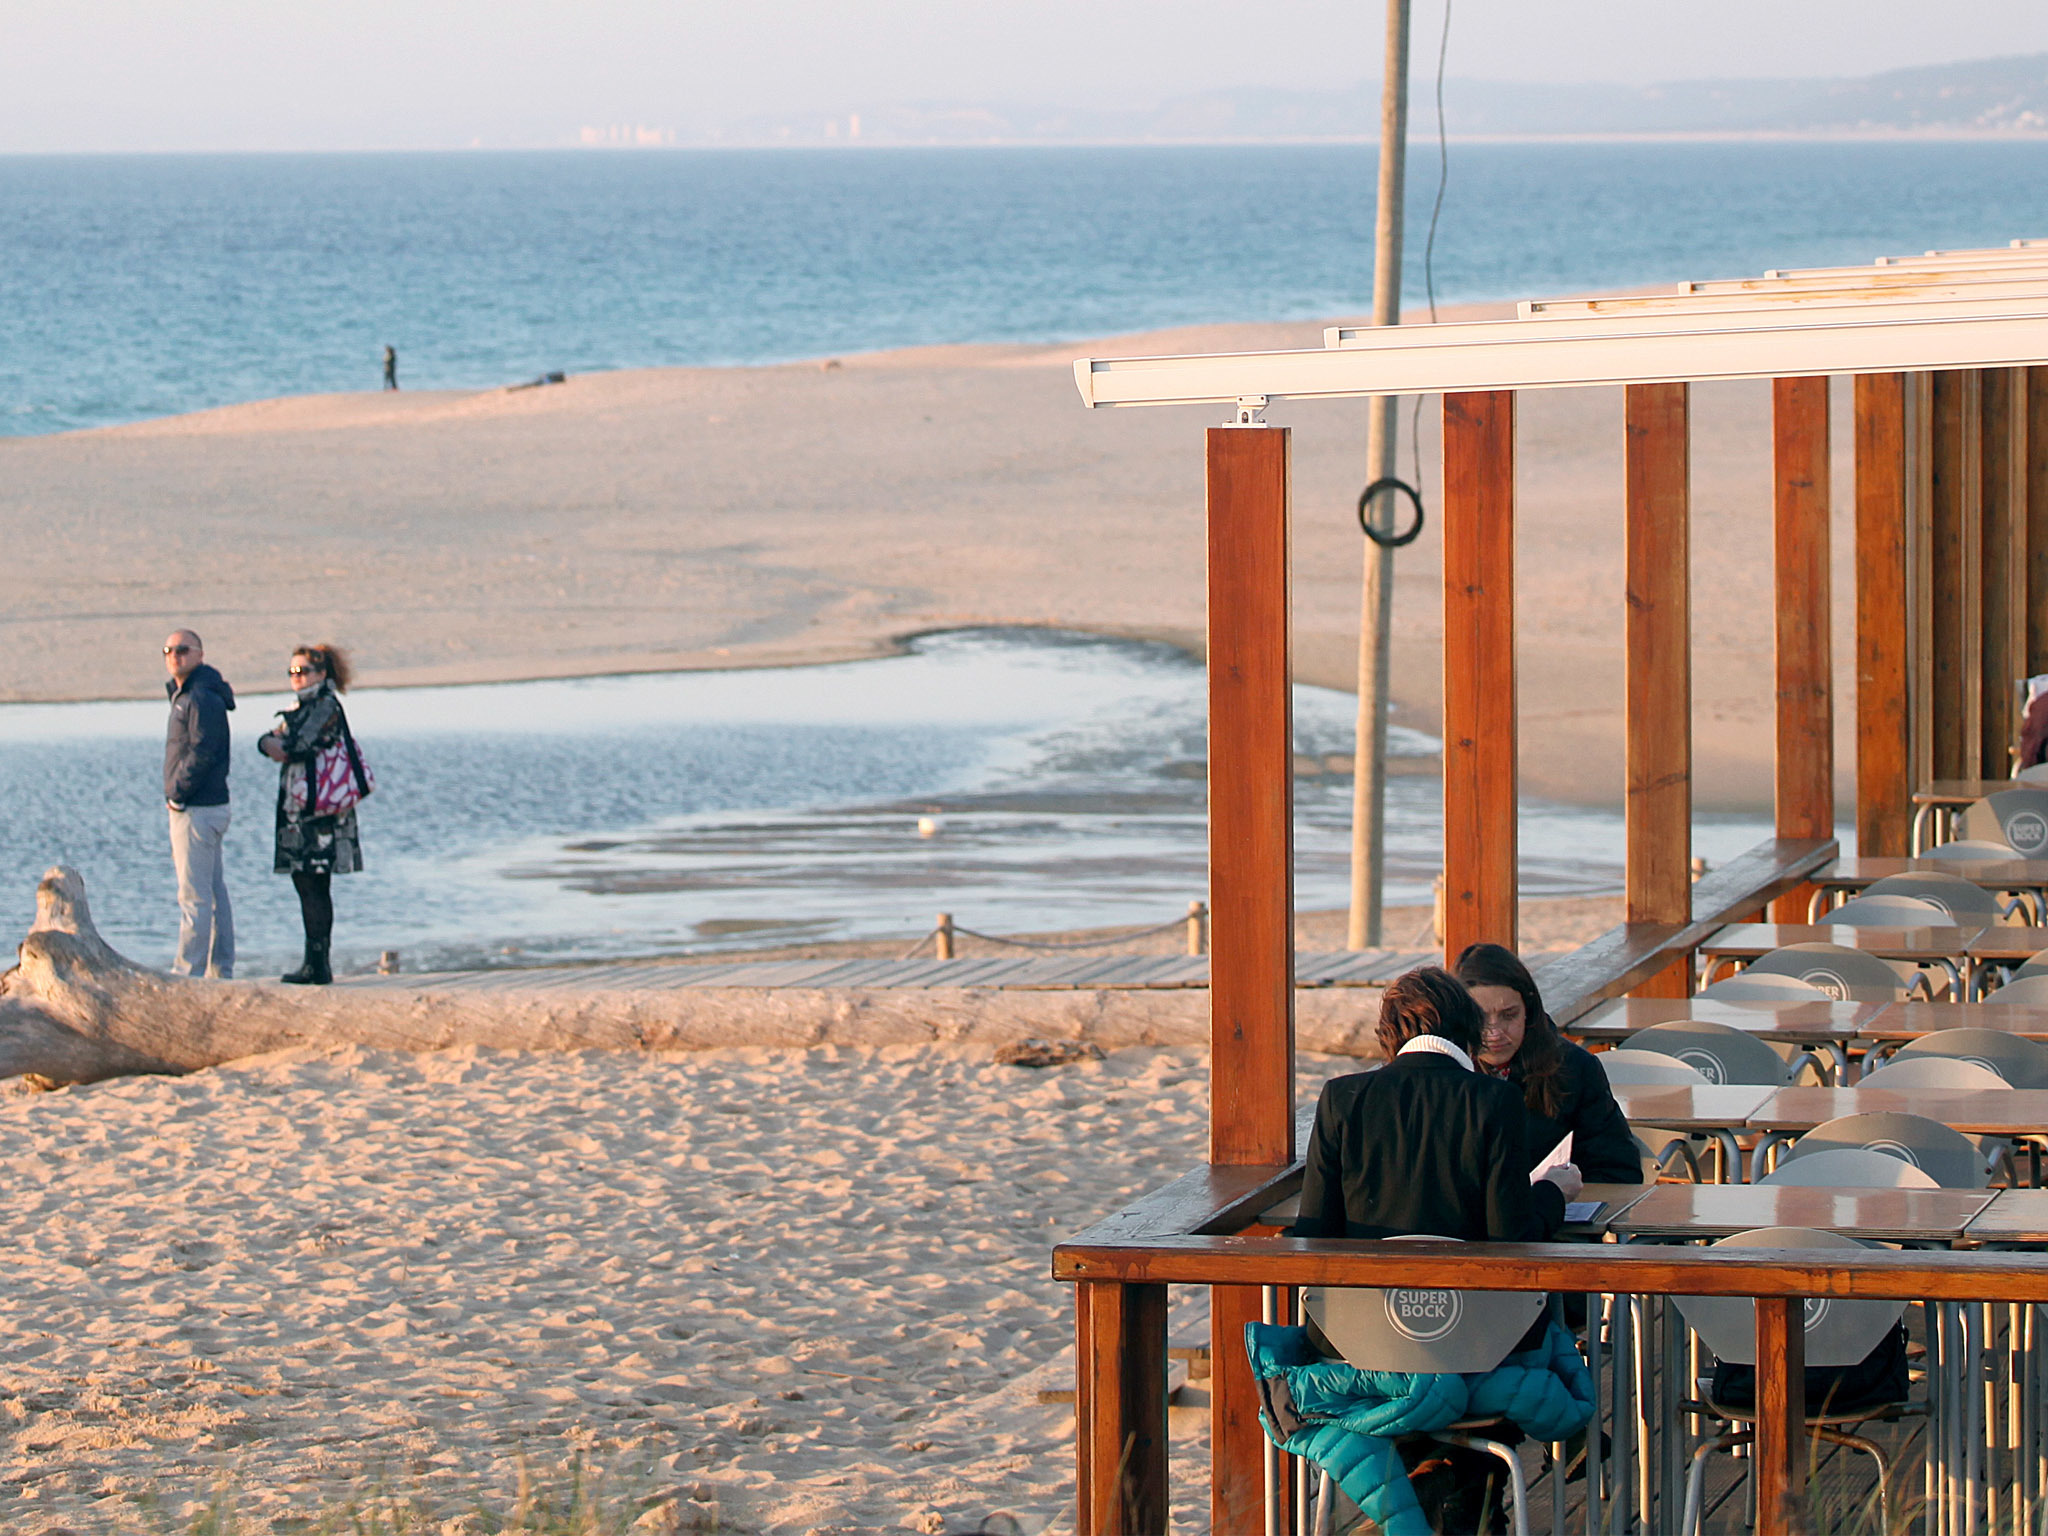 Bar do Peixe - Praia do Moinho de Baixo, Meco